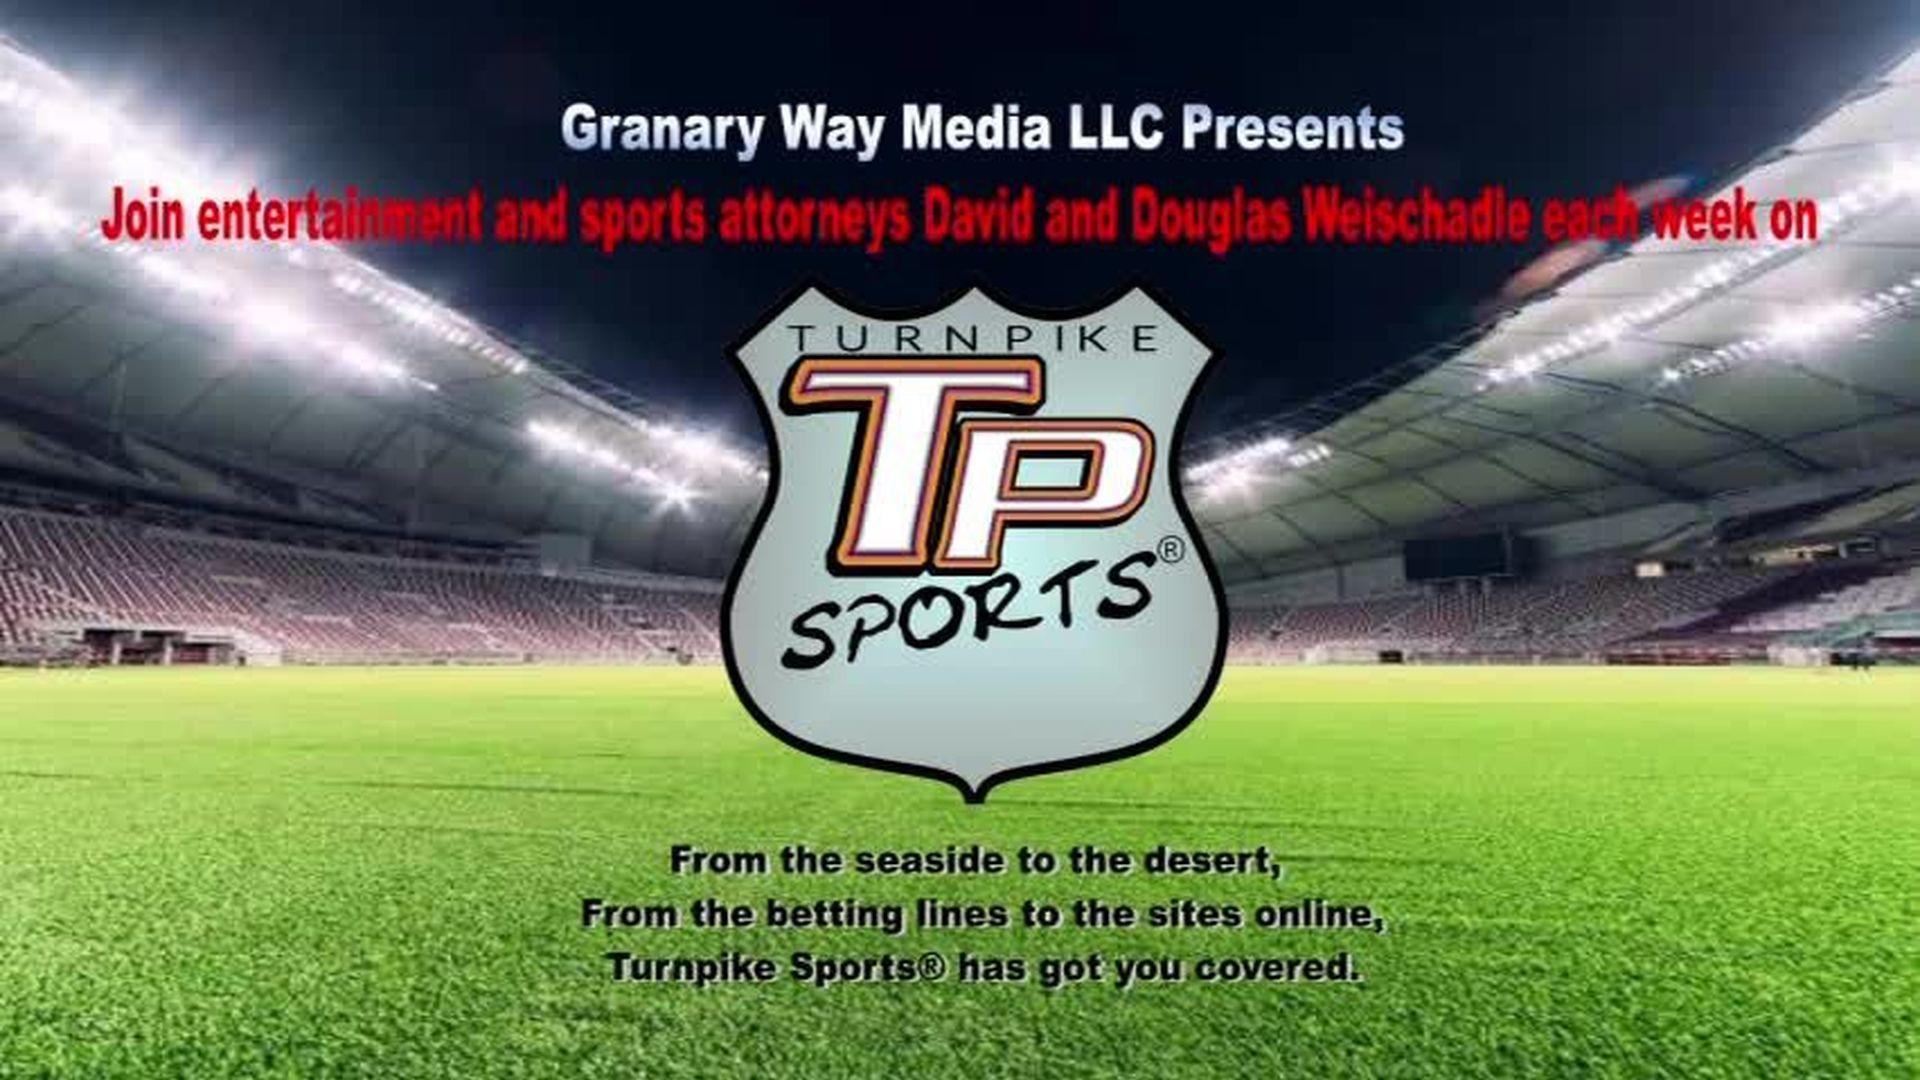 Turnpike Sports® - S 3 - Ep 18